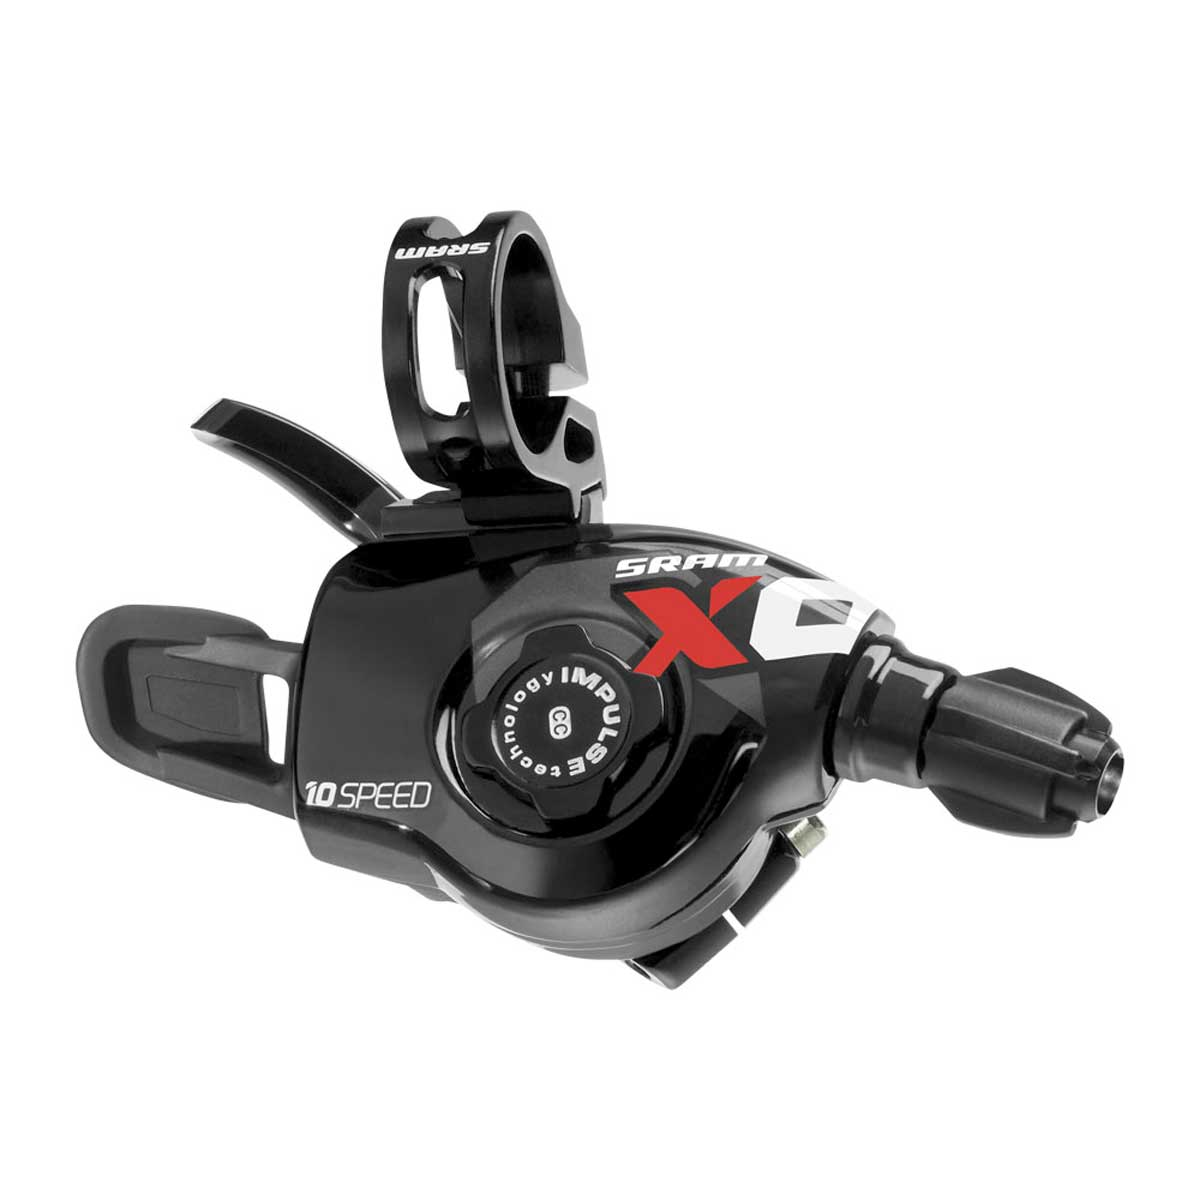 Sram X0 10-Speed Trigger Mountain Bike Shifter